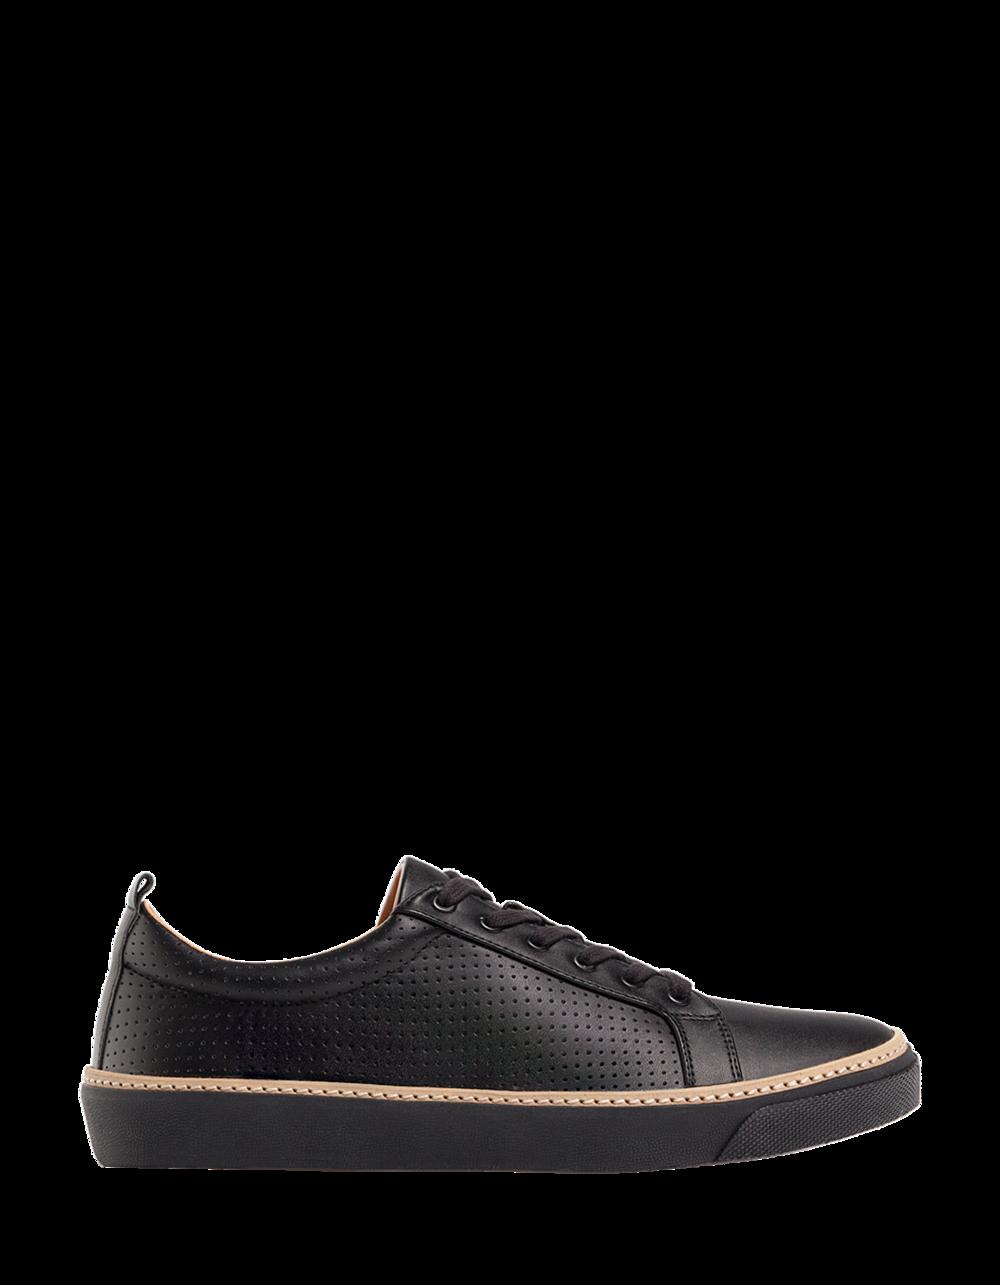 StradivariusMan_shoes (14).png